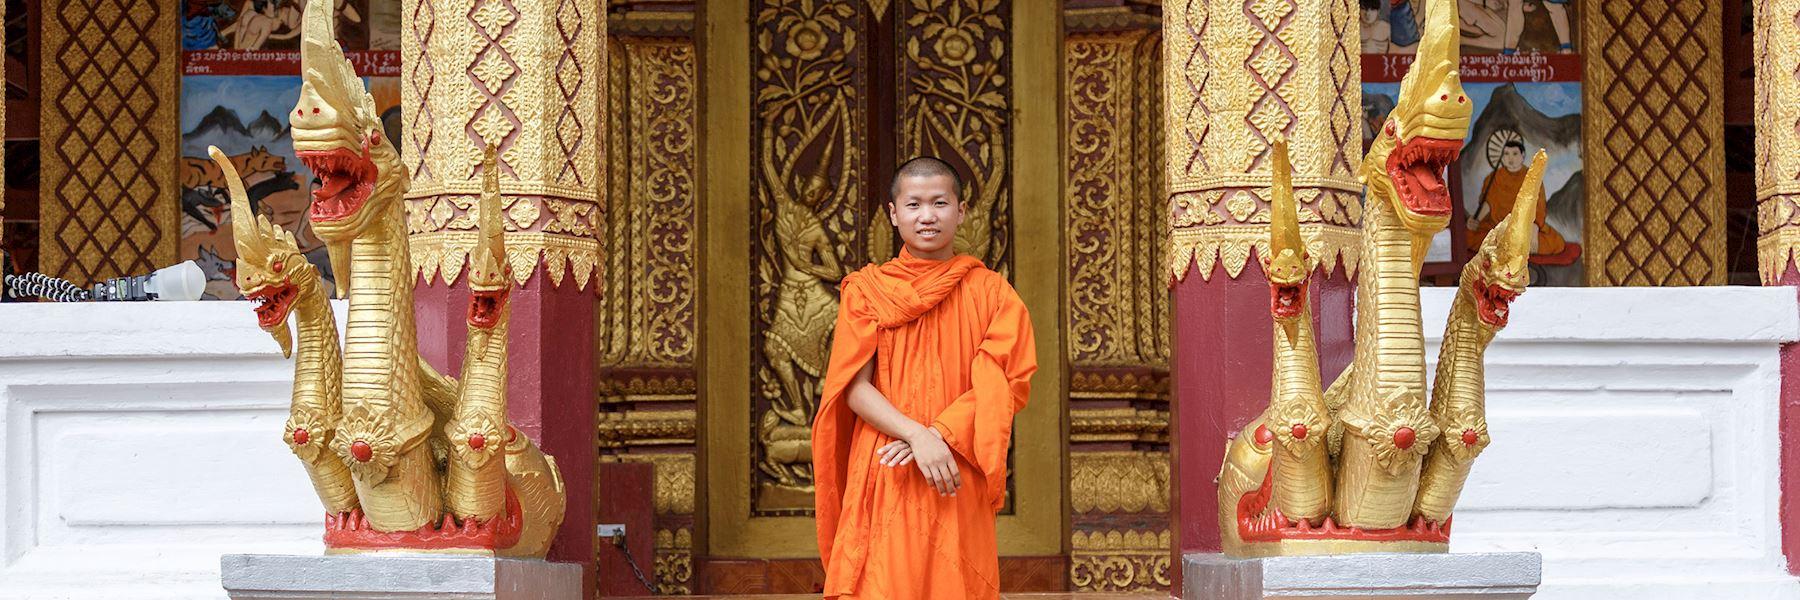 Laos holidays  2019 & 2020